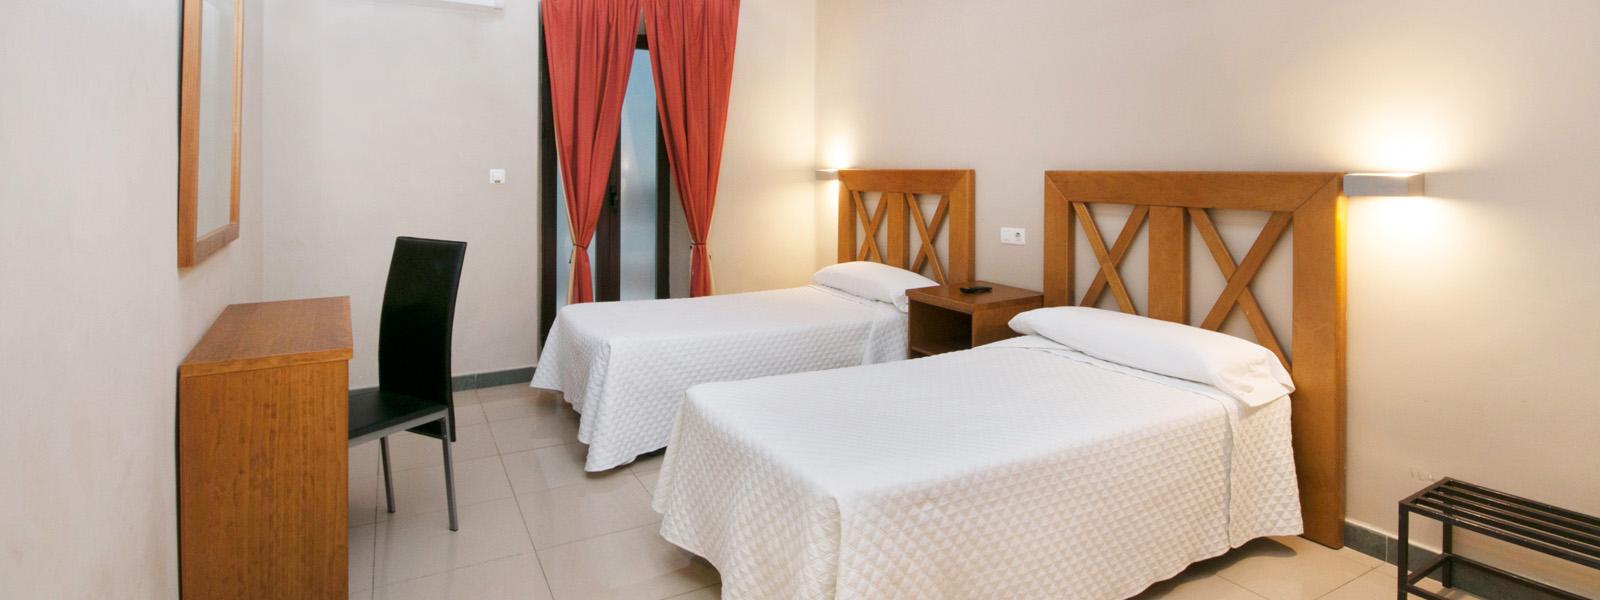 Doble matrimonio hostal atenas hotel en granada centro for Alojamiento barato en sevilla centro